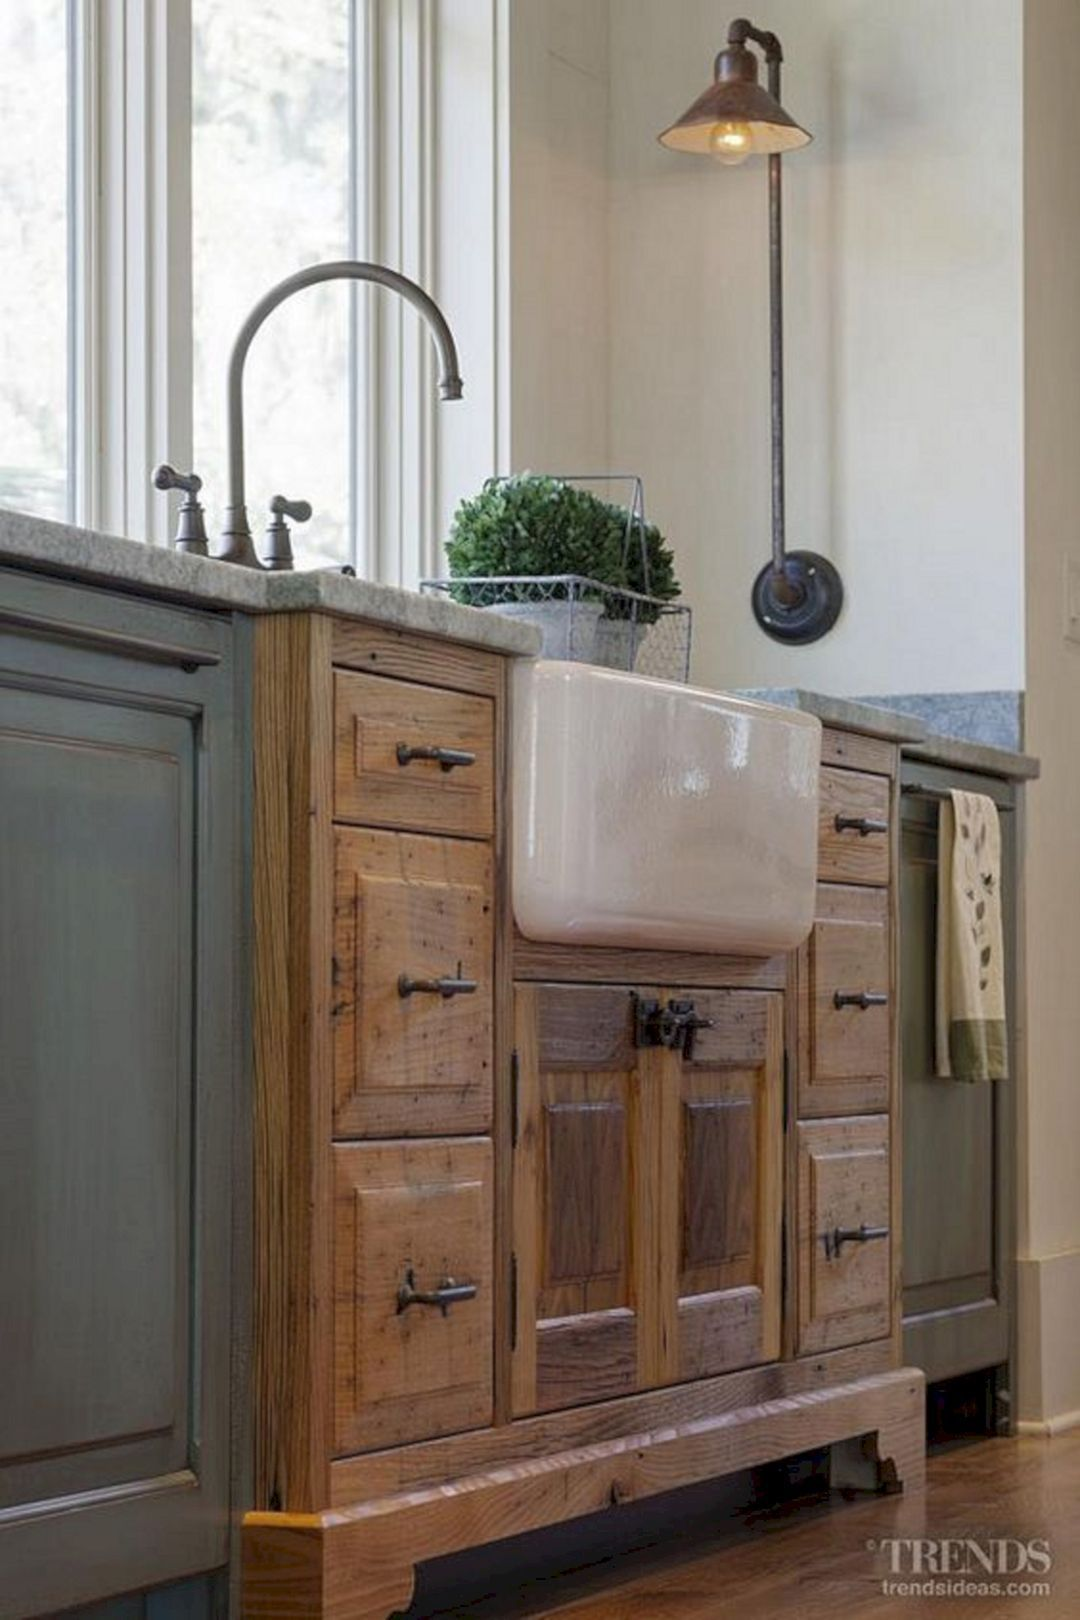 stanley european farmhouse cabinet ideas kichen remodel rh pinterest com